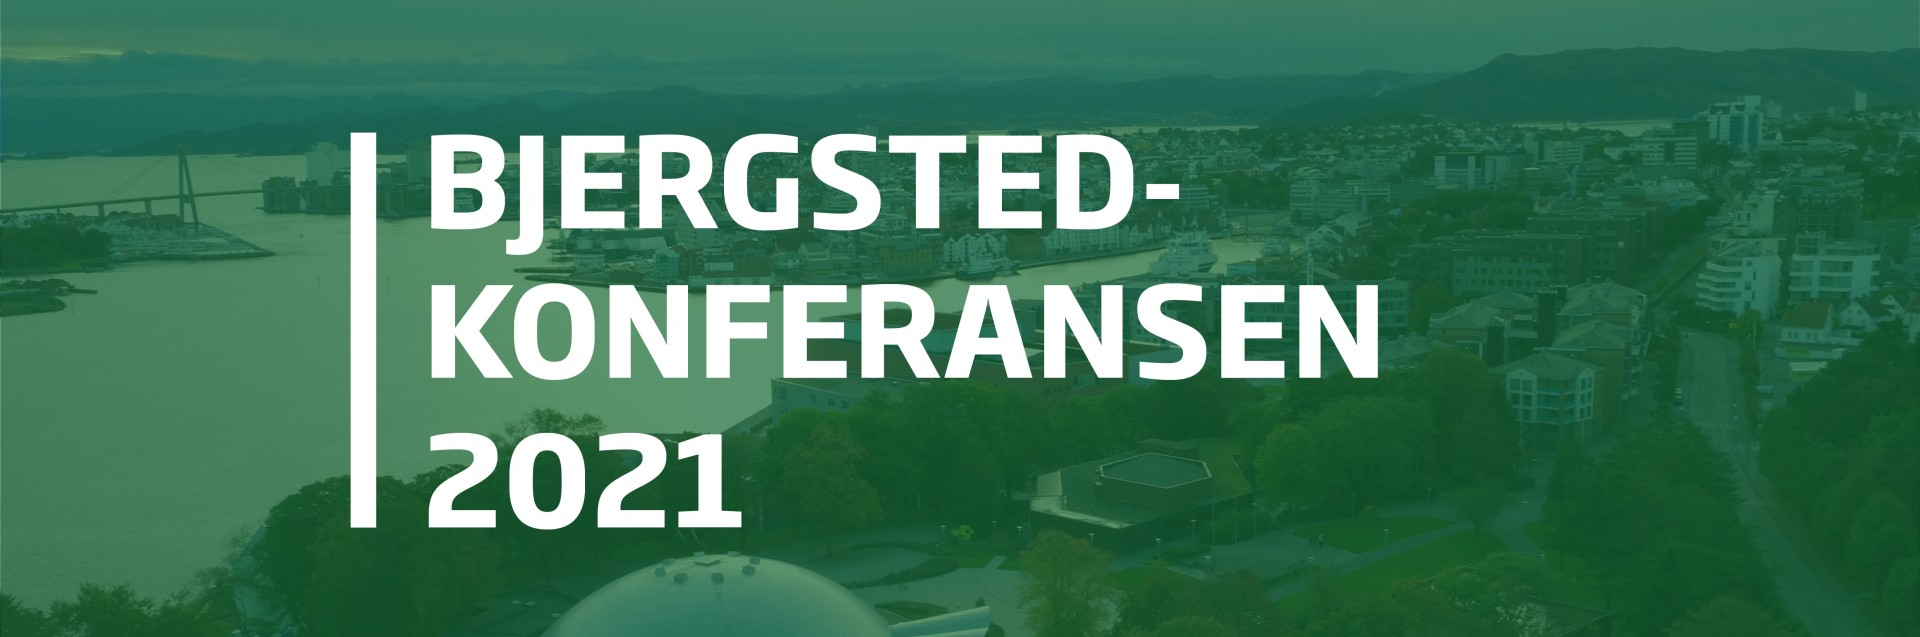 Bjergsted-konferansen 2021